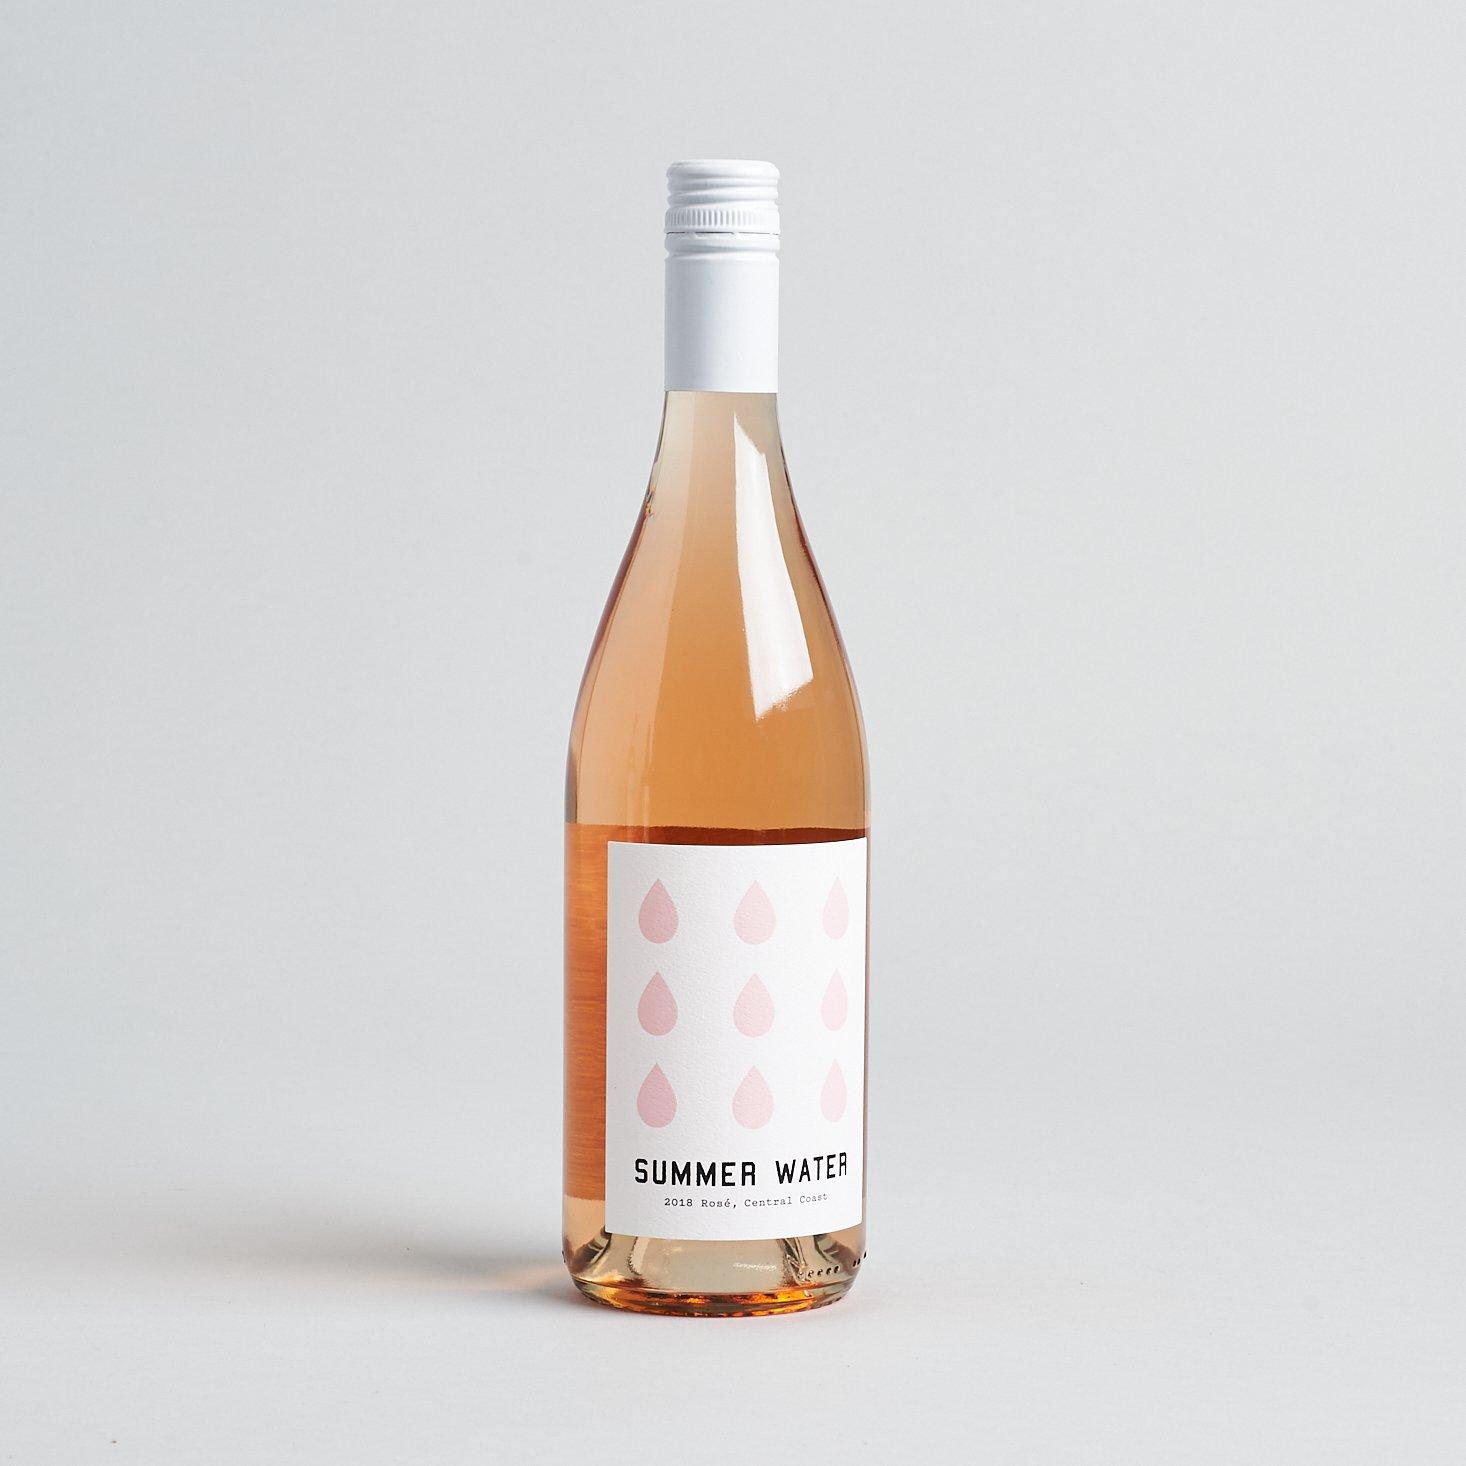 Winc September 2019 - 2018 Summer Water Rosé full bottle view